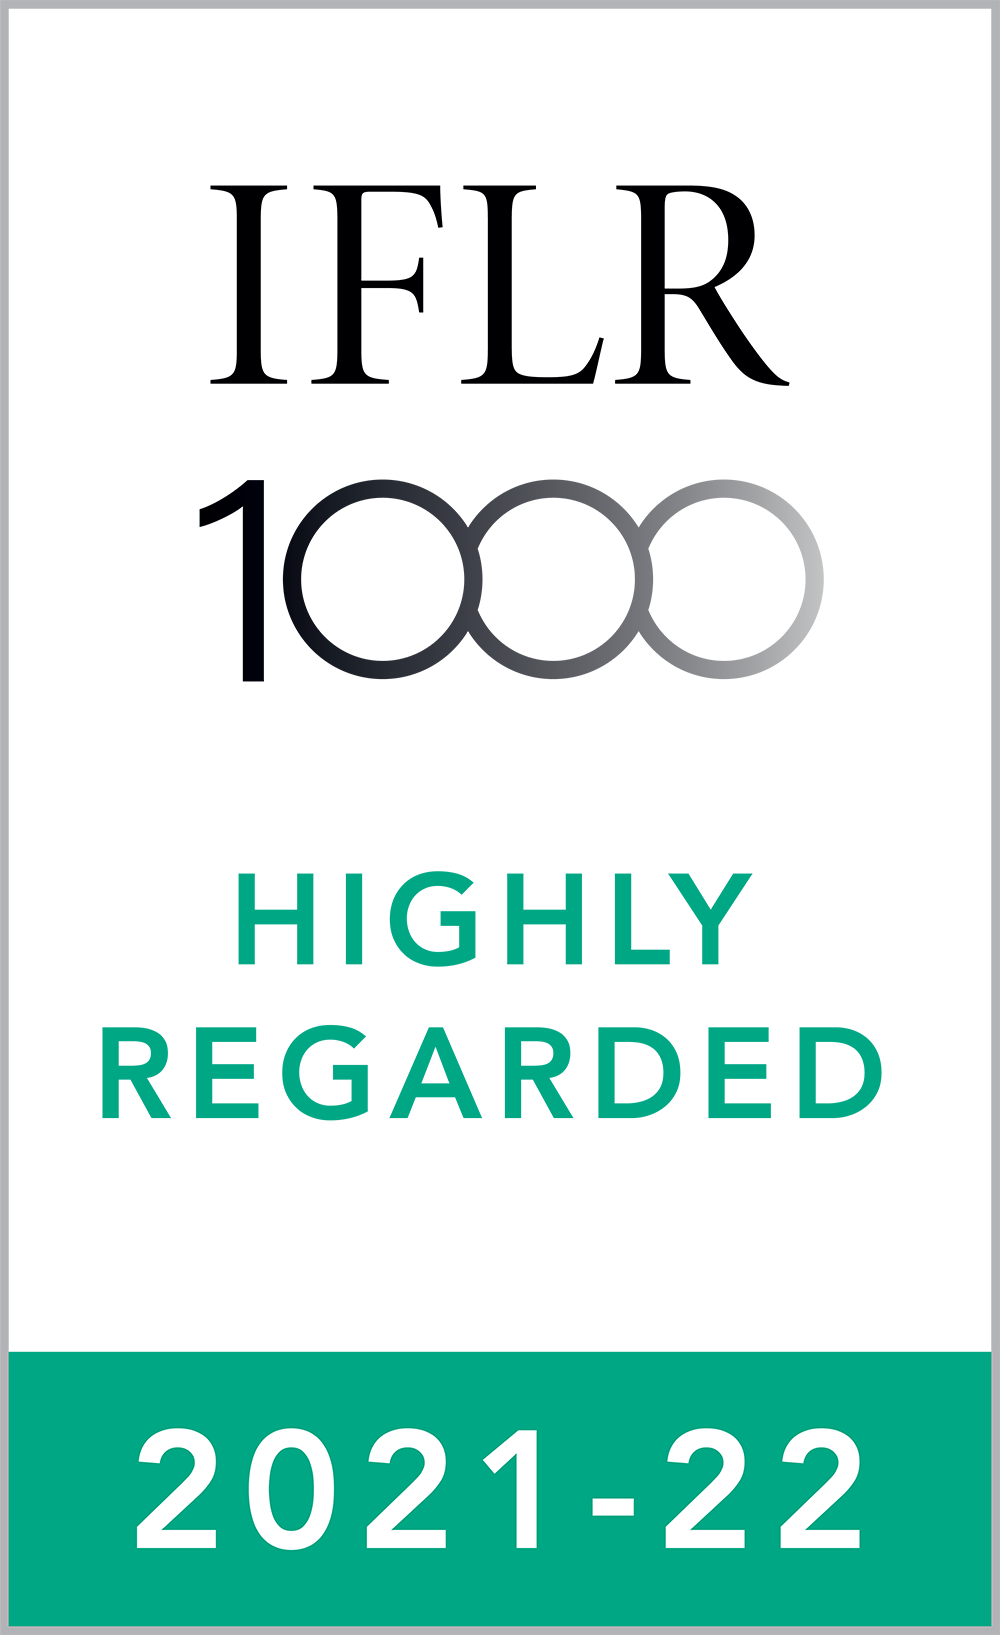 IFLR Highly Regarded 2021-22